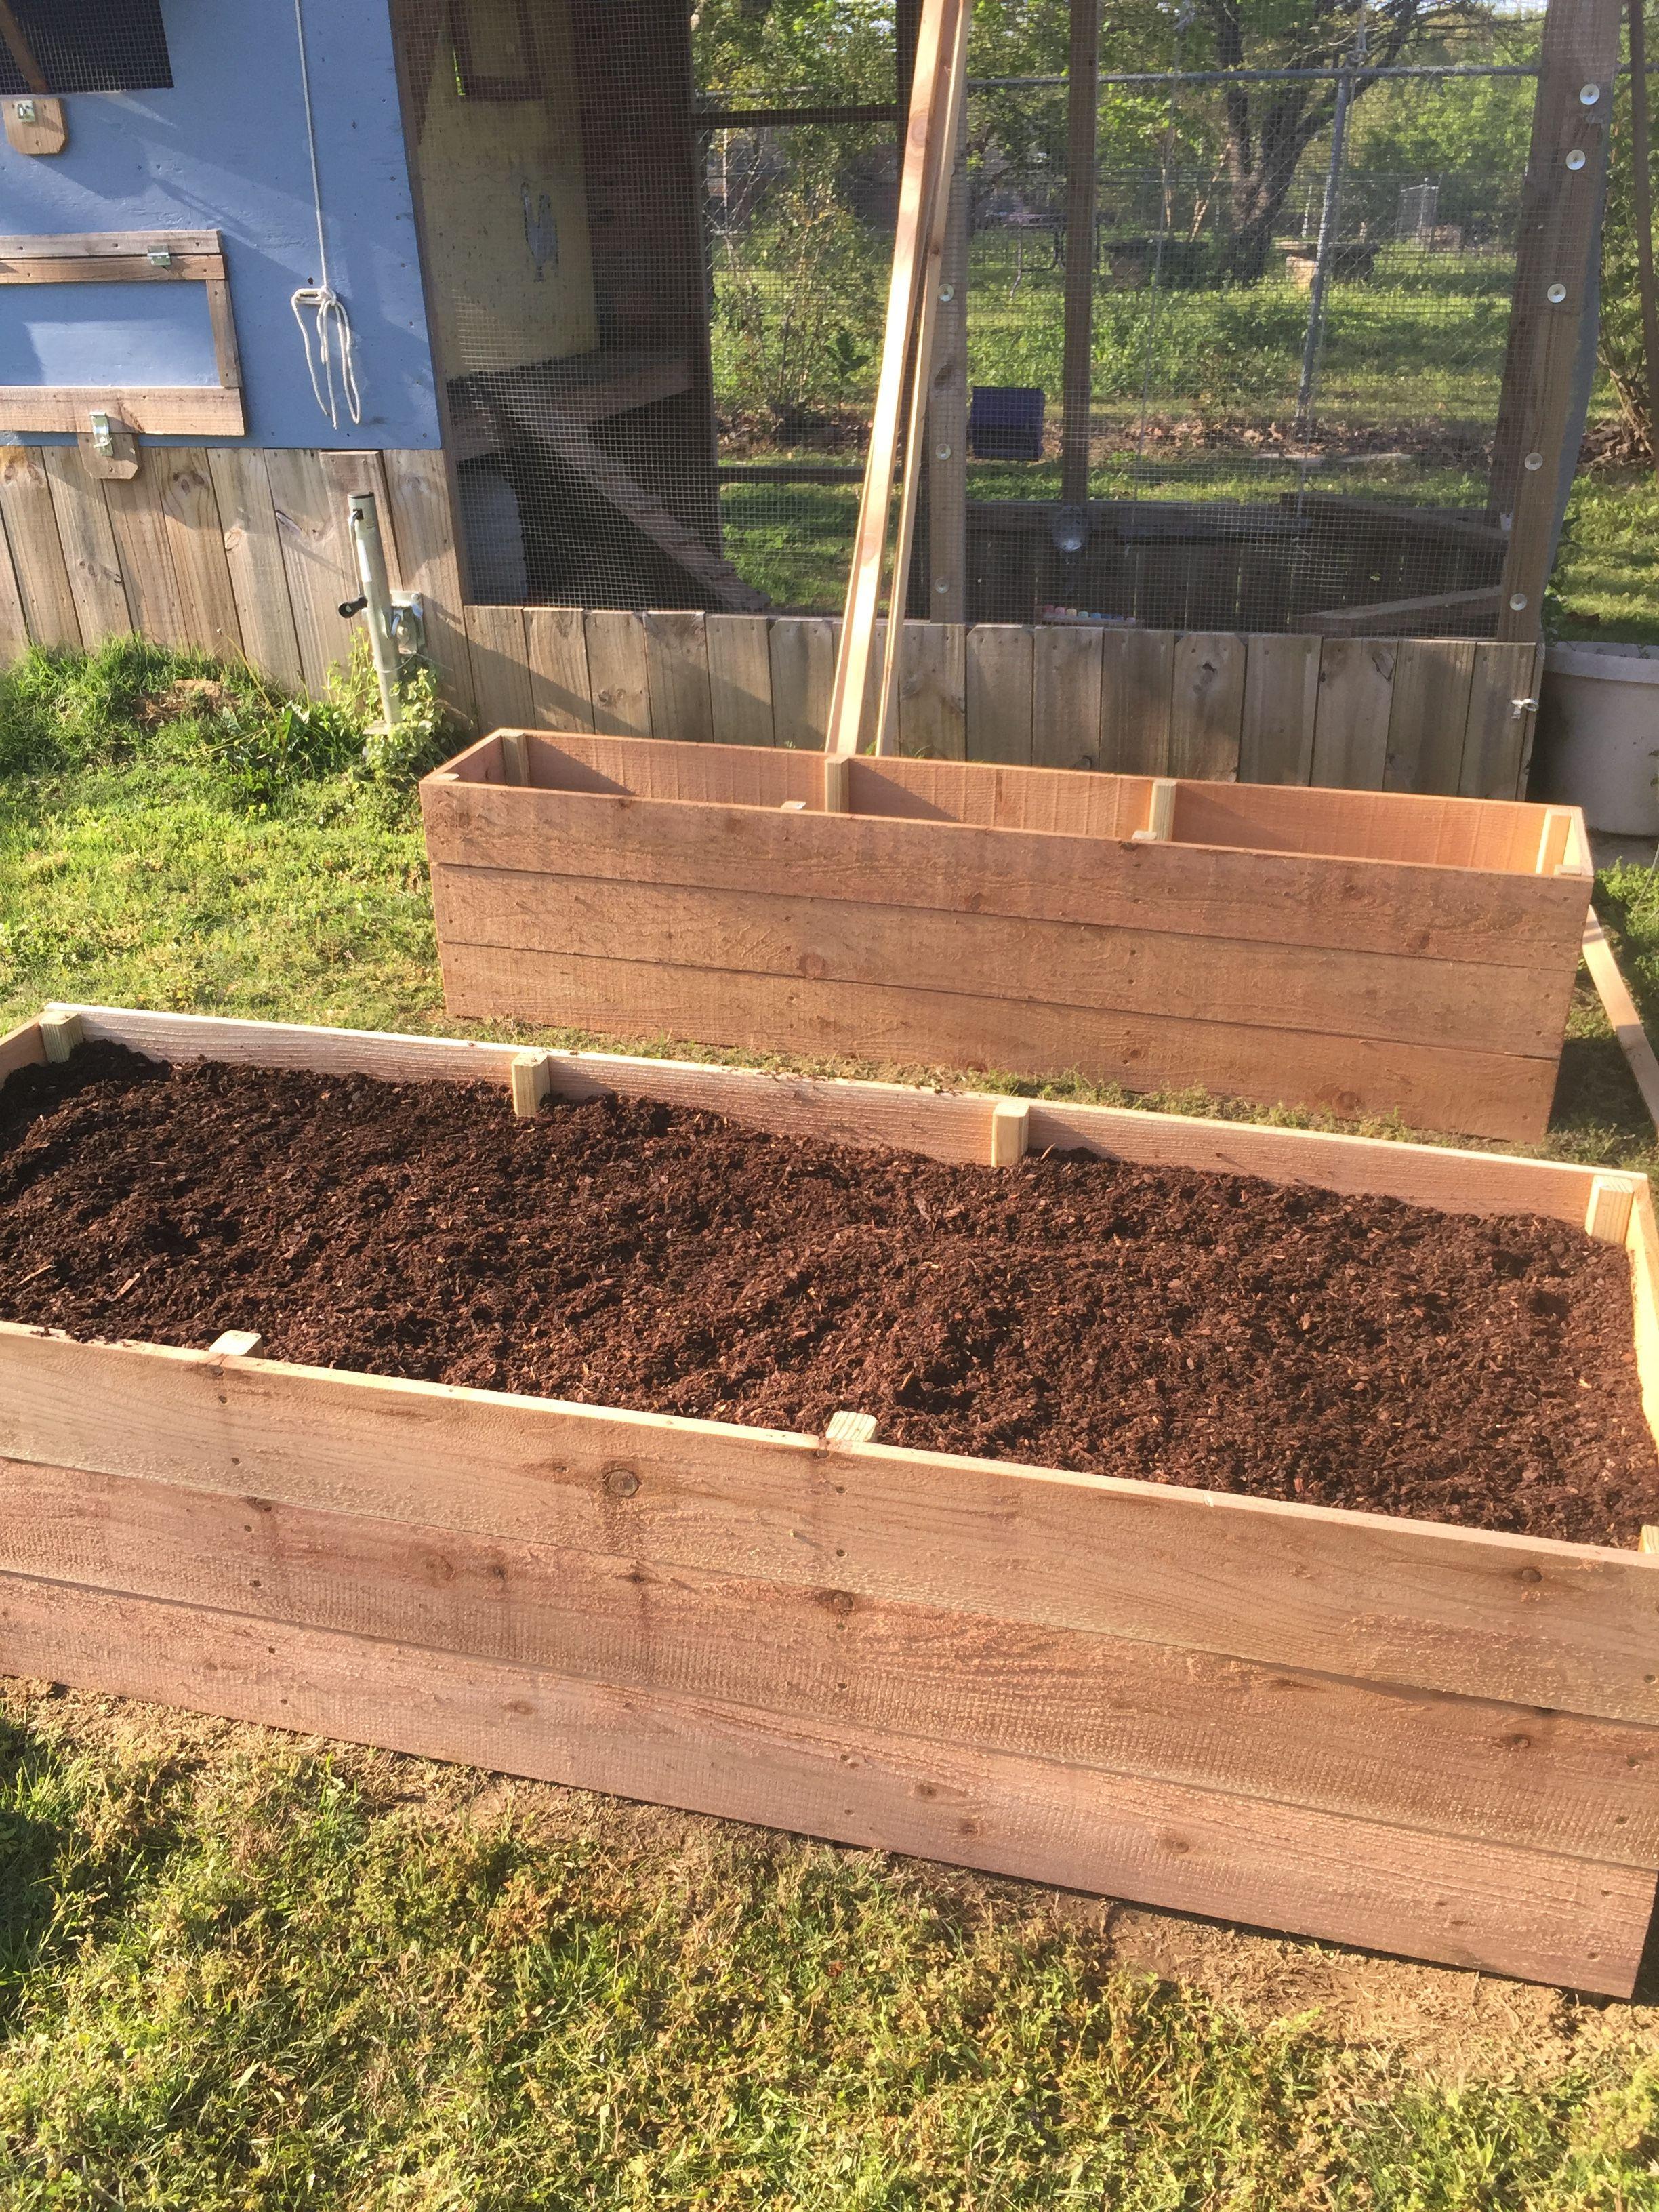 Cedar Fence Board Raised Garden Beds A Great Alternative To